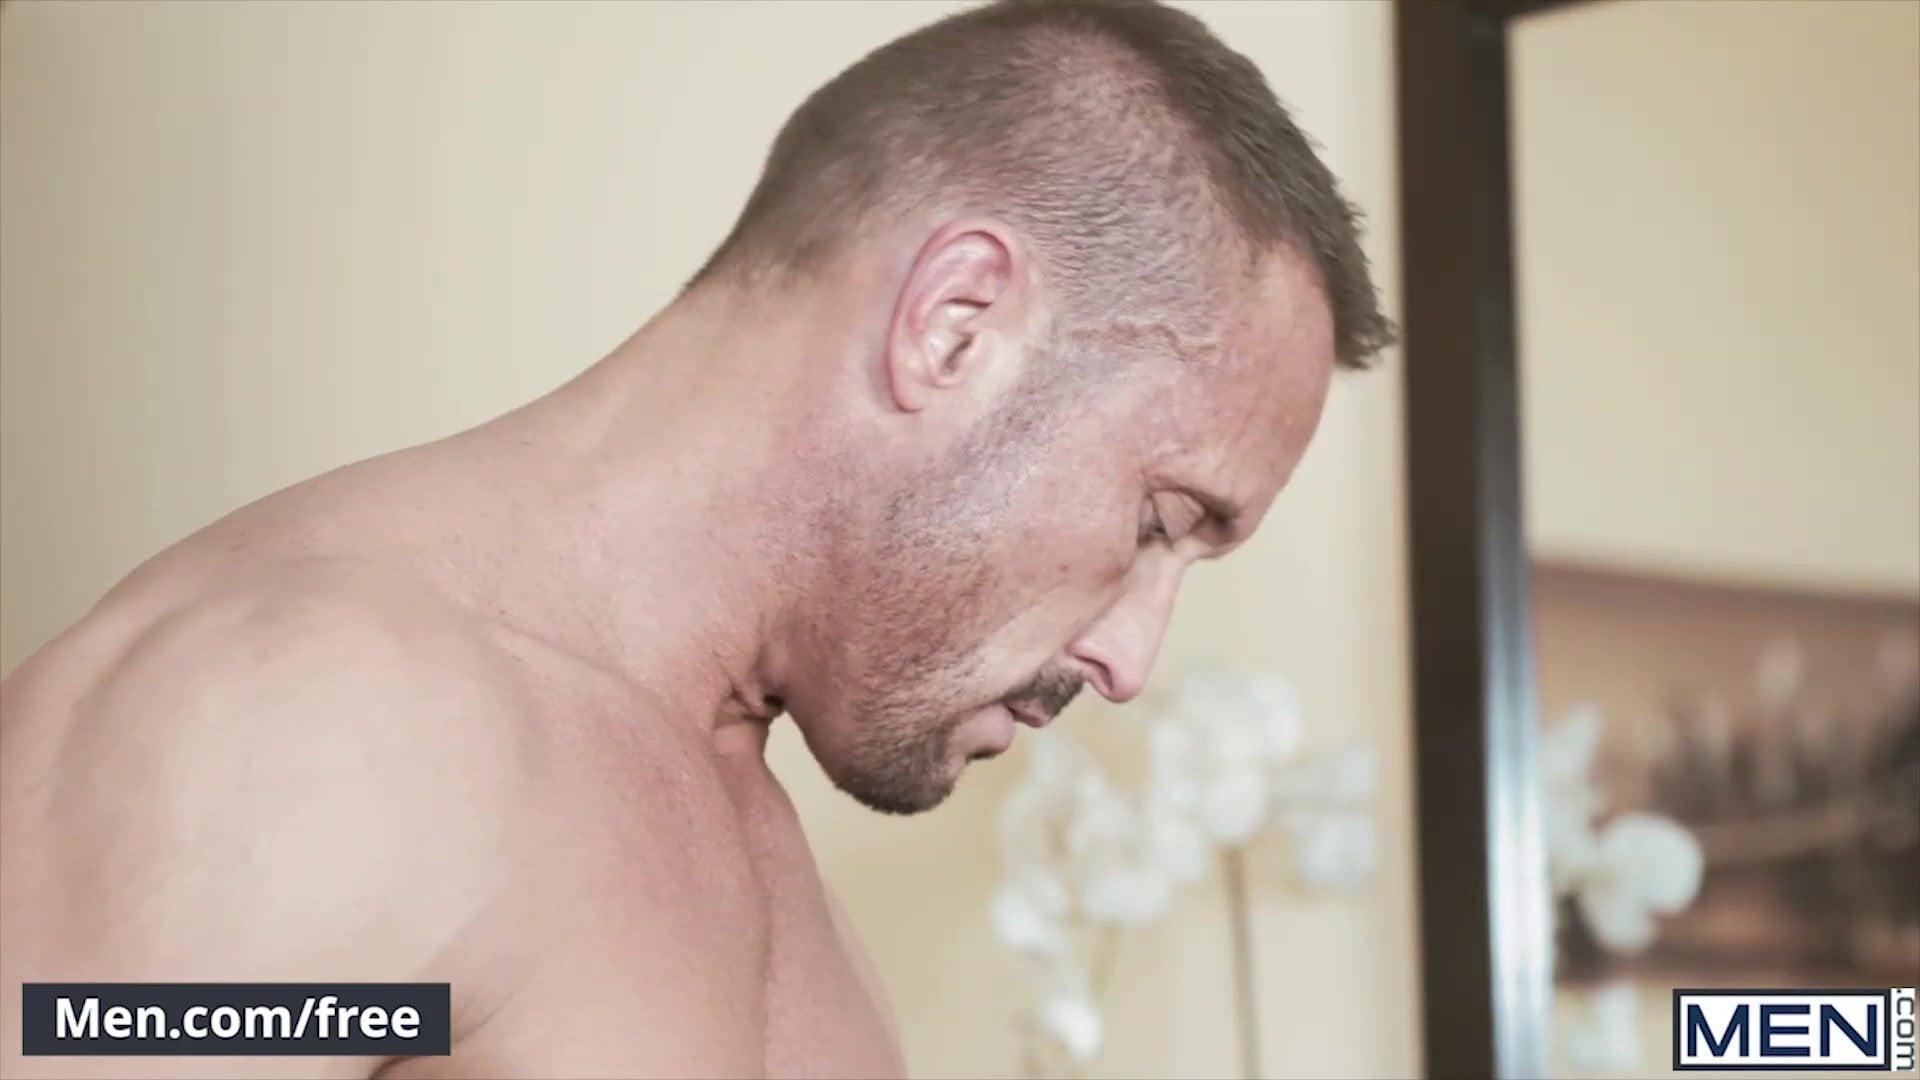 Myles Landon Xavier Ryan – Promenade Thief – Males.com